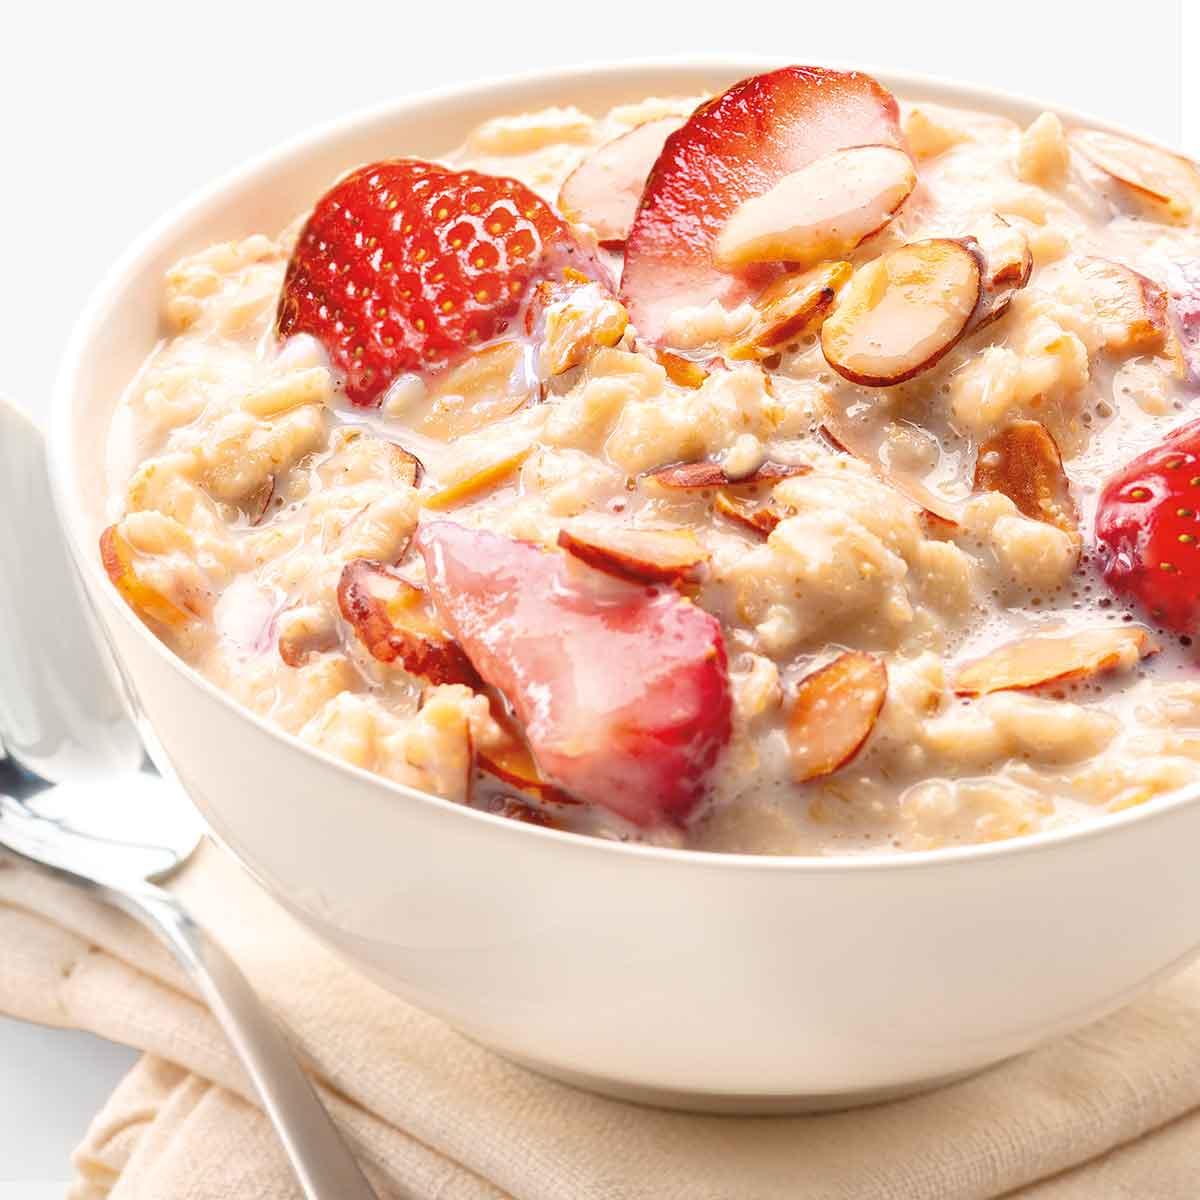 Oatmeal made with Almondmilk